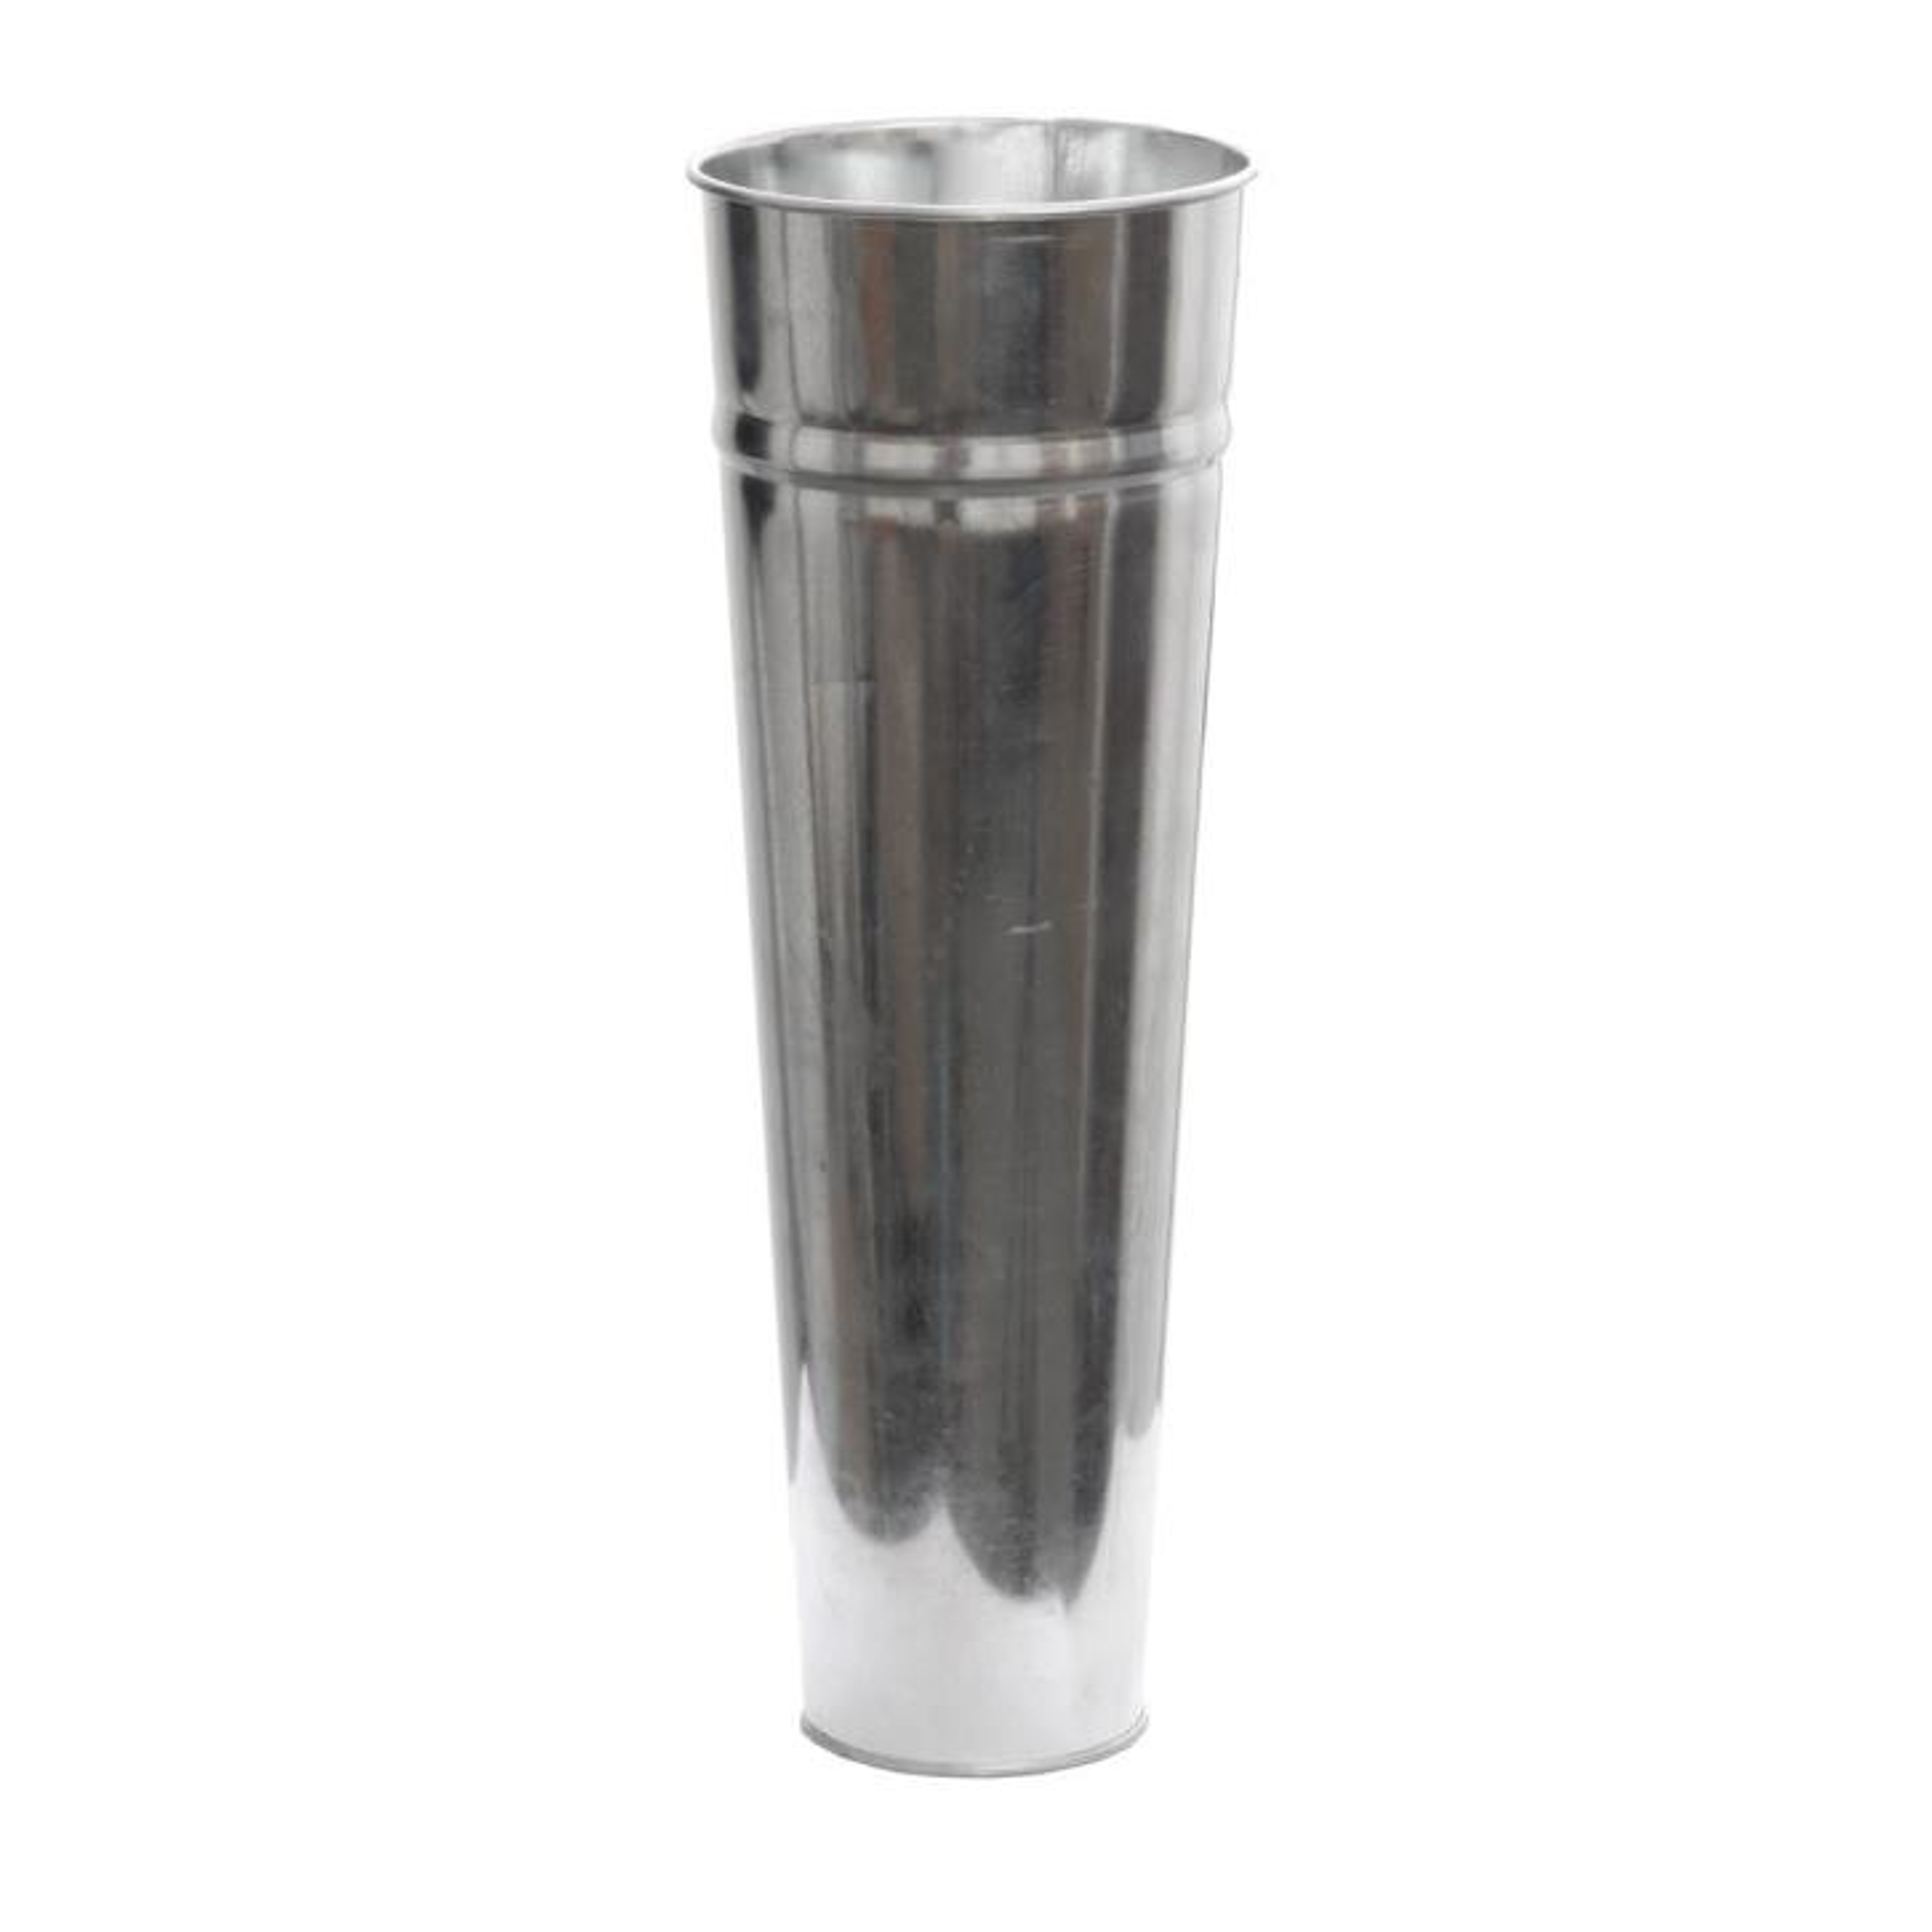 Blumenvase Vase, verzinkt